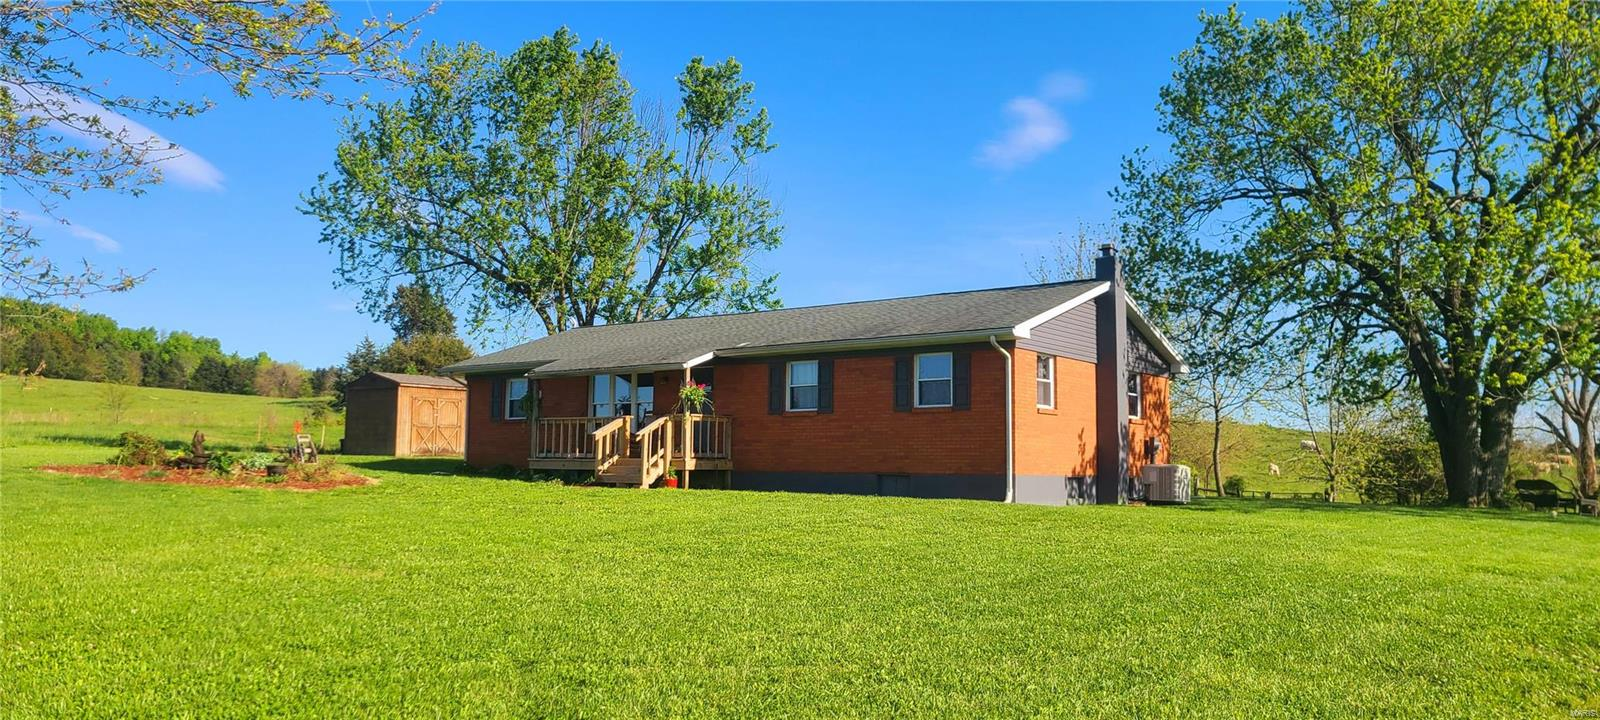 1053 Madison 219 Property Photo - Fredericktown, MO real estate listing